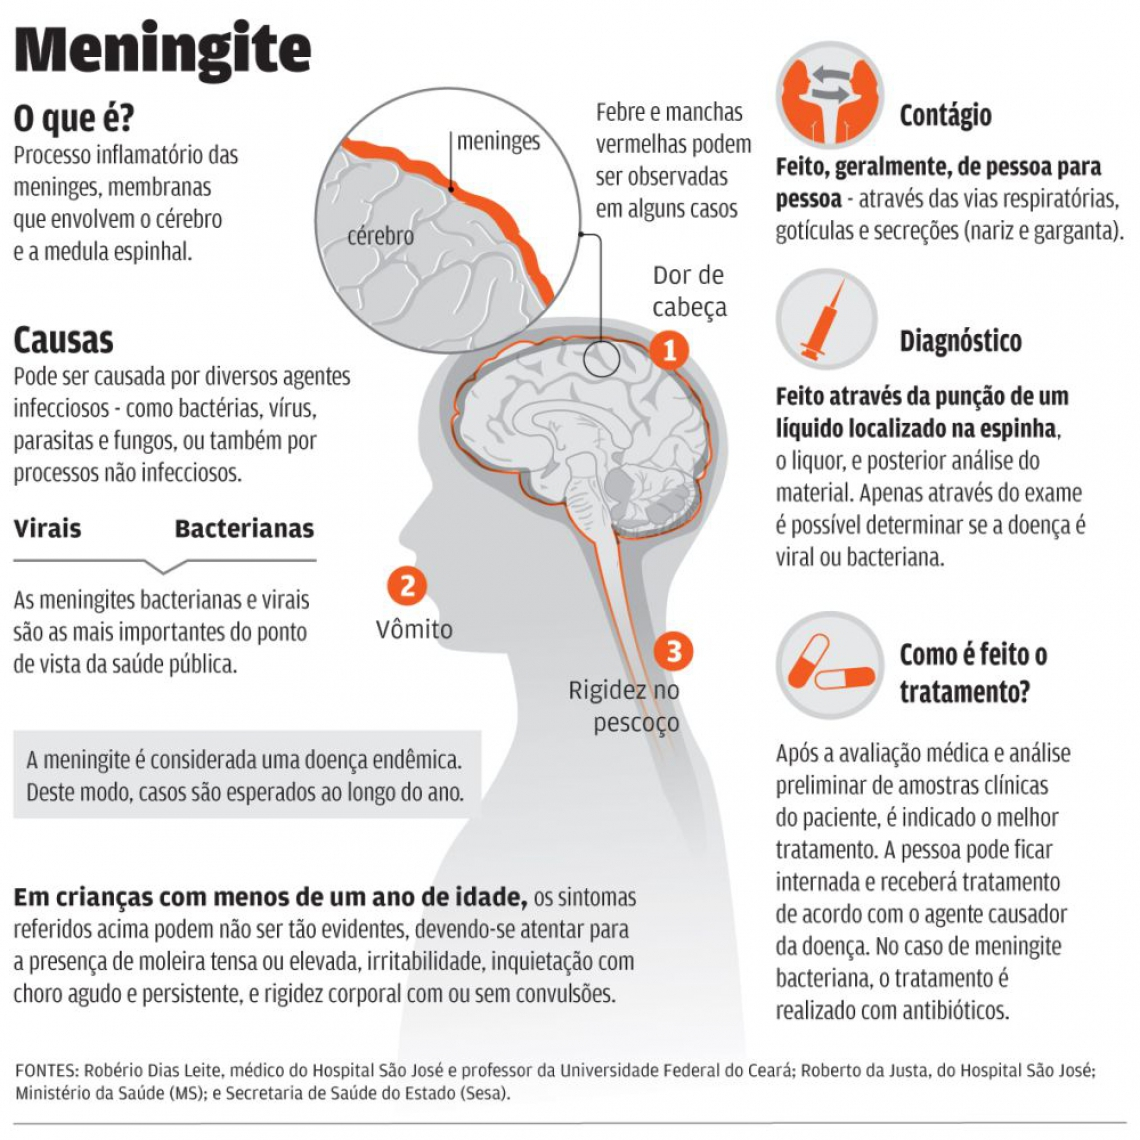 Luciana Pimenta/ Infografia O POVO